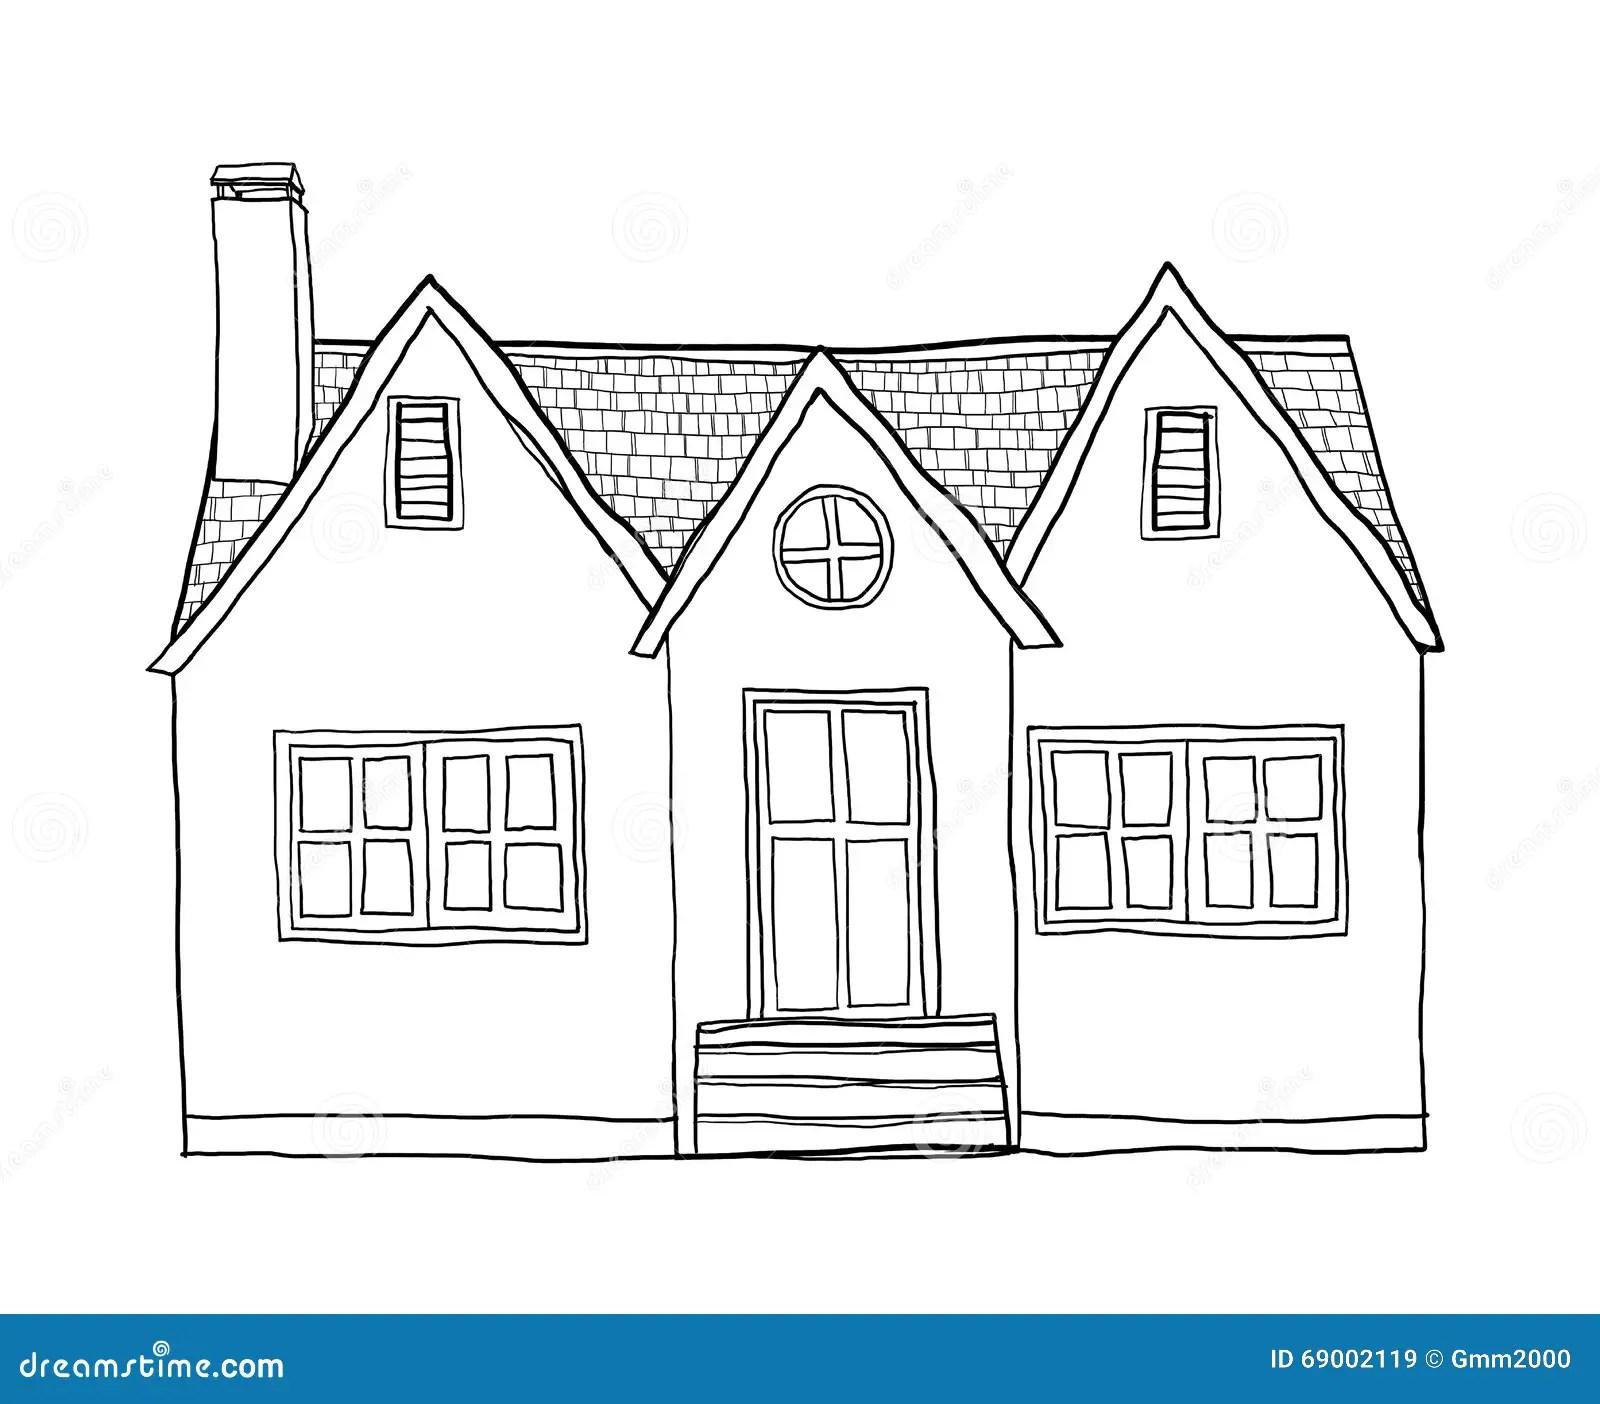 Small House Cute Lineart Illustration Stock Illustration